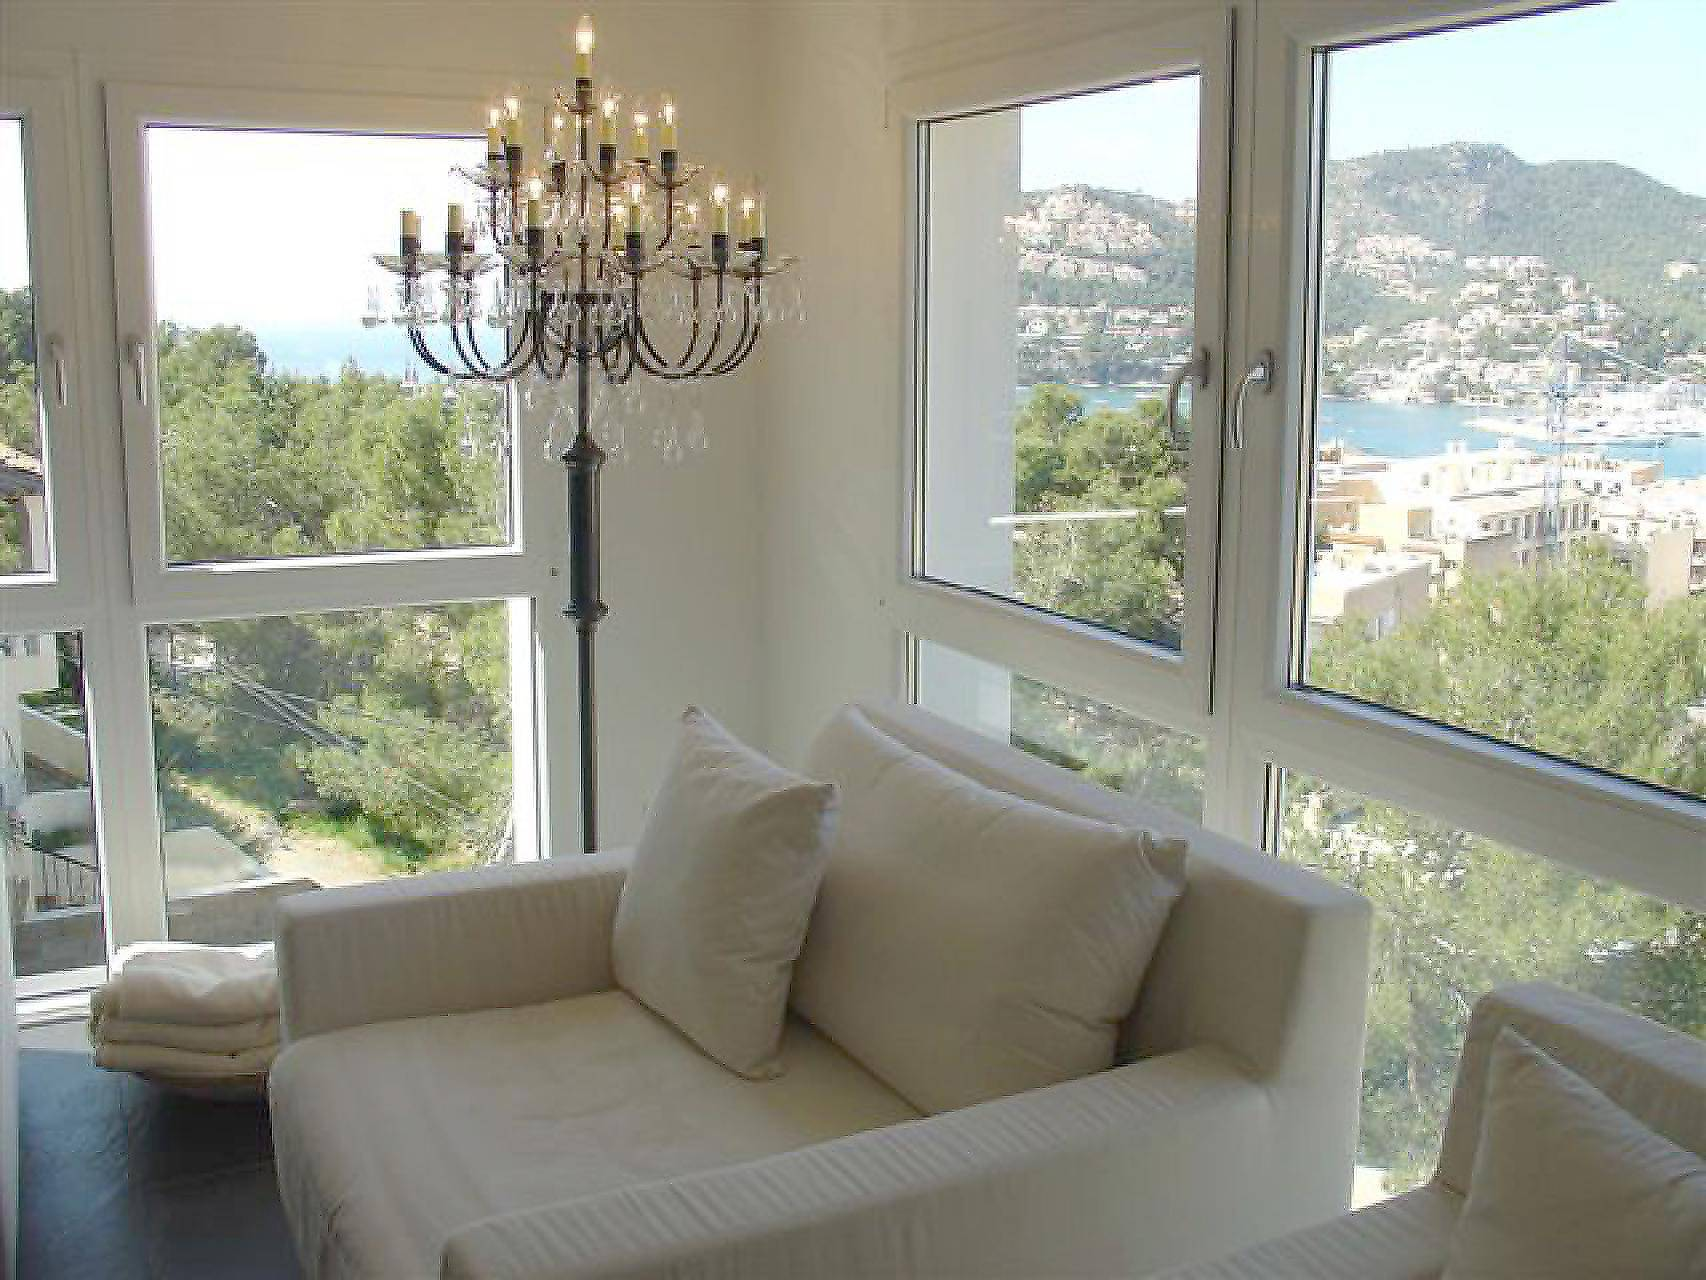 01-04 Bauhaus Villa Mallorca Südwesten Bild 17